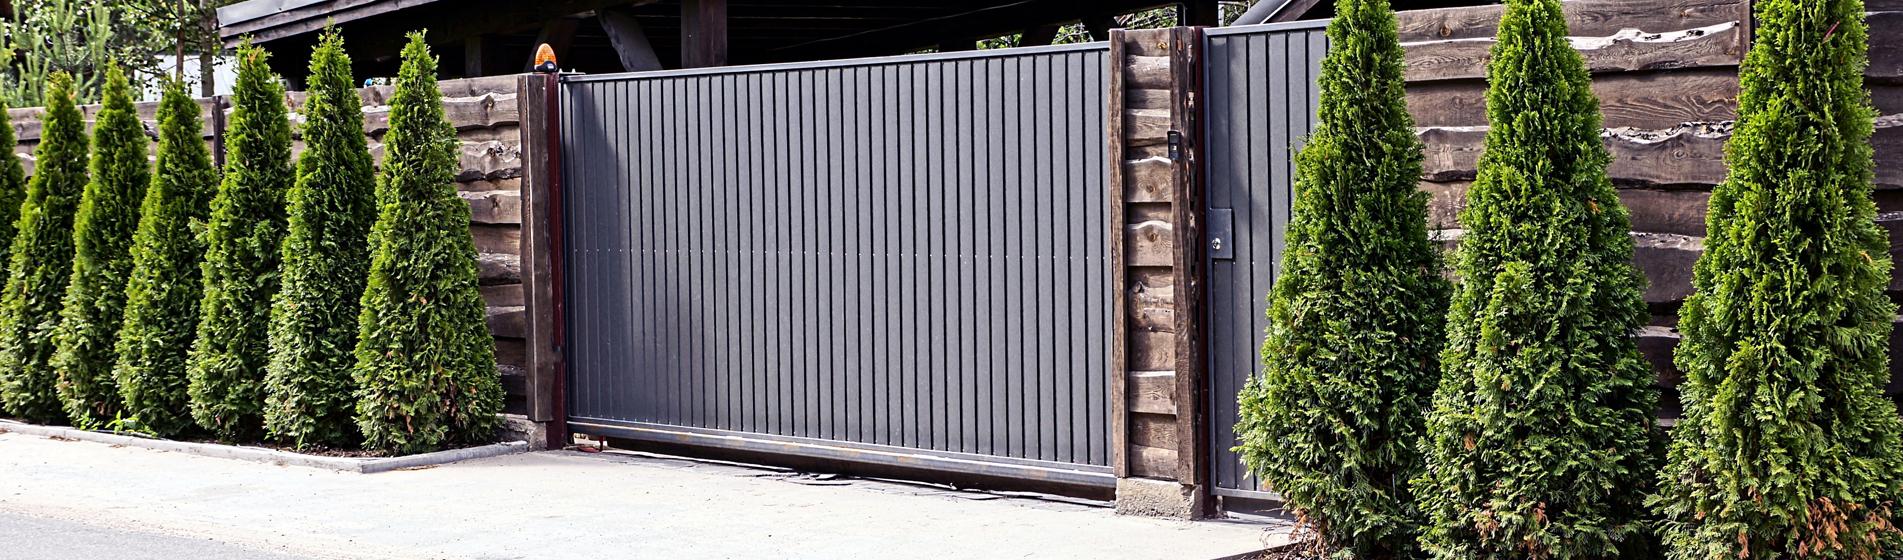 prix portail coulissant alu 30 Gard